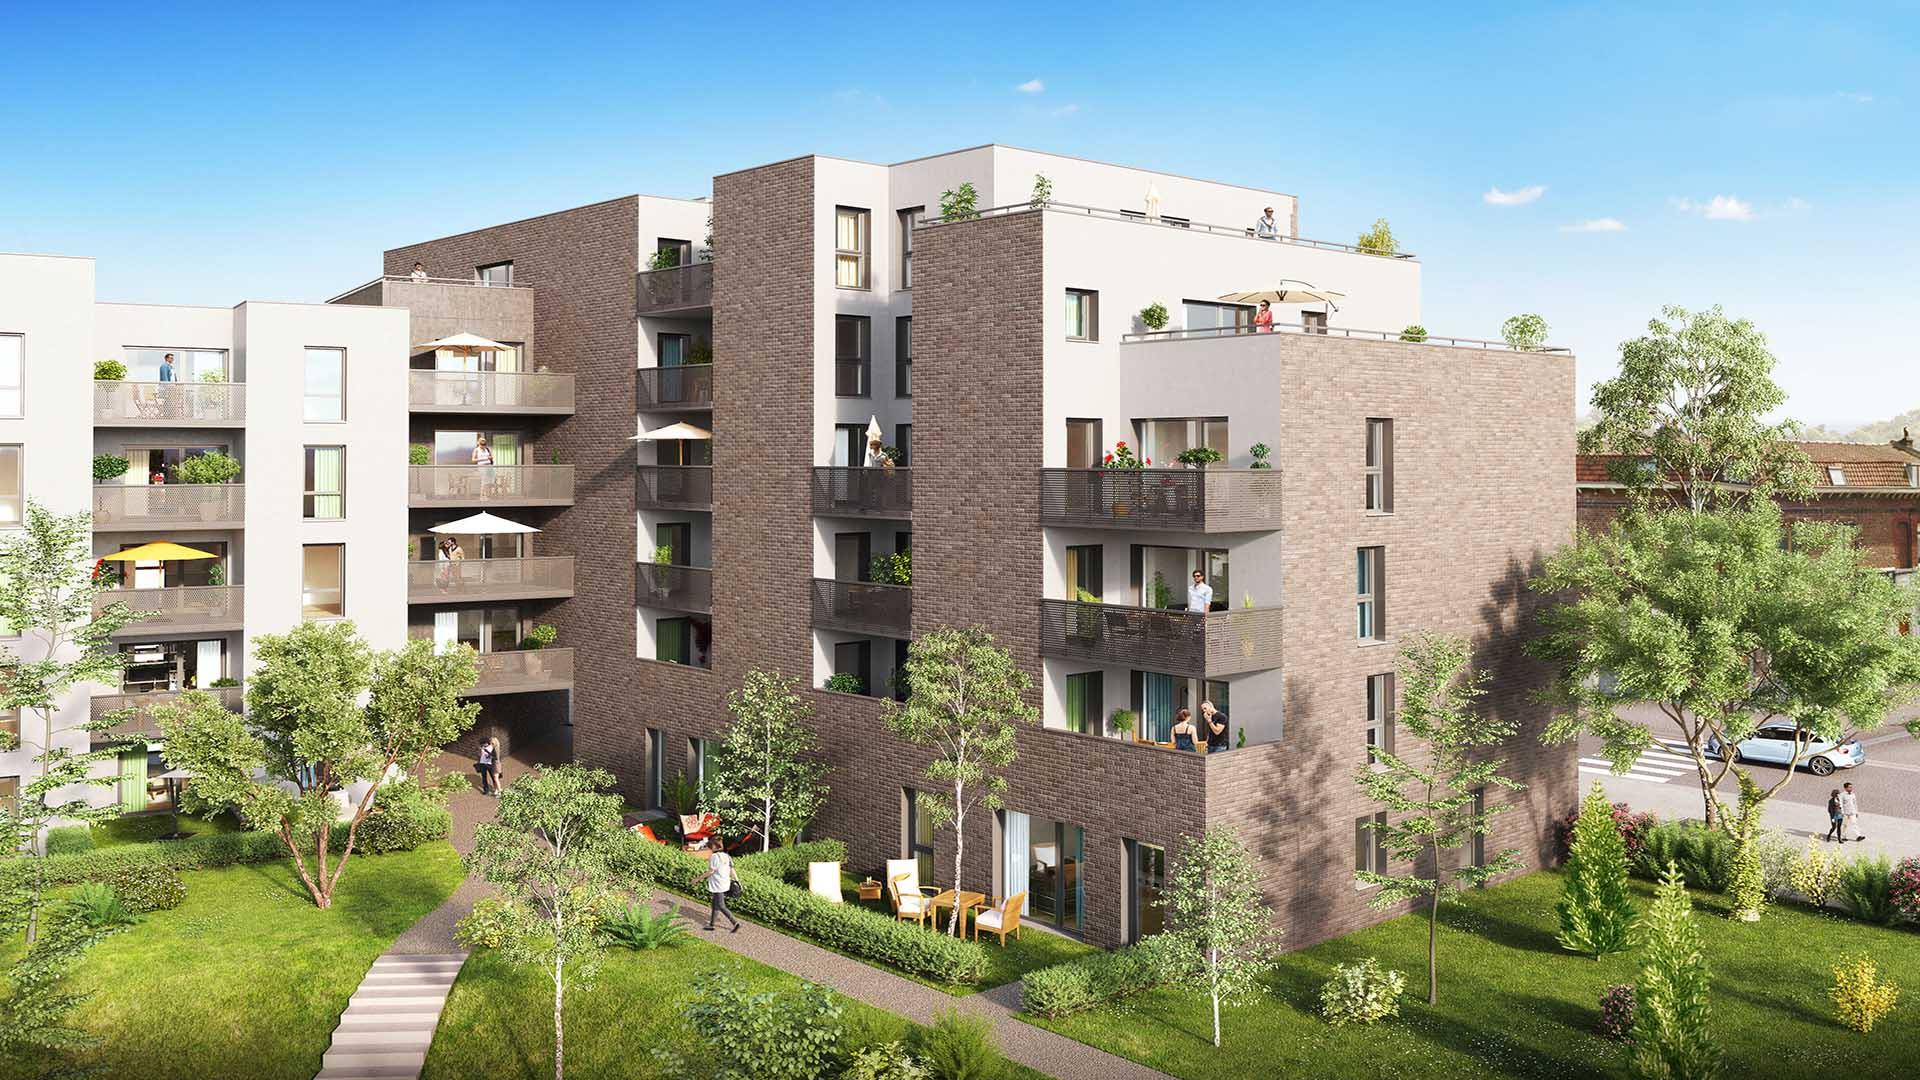 Maison neuve lille latest focus with maison neuve lille for Tarif raccordement edf maison neuve